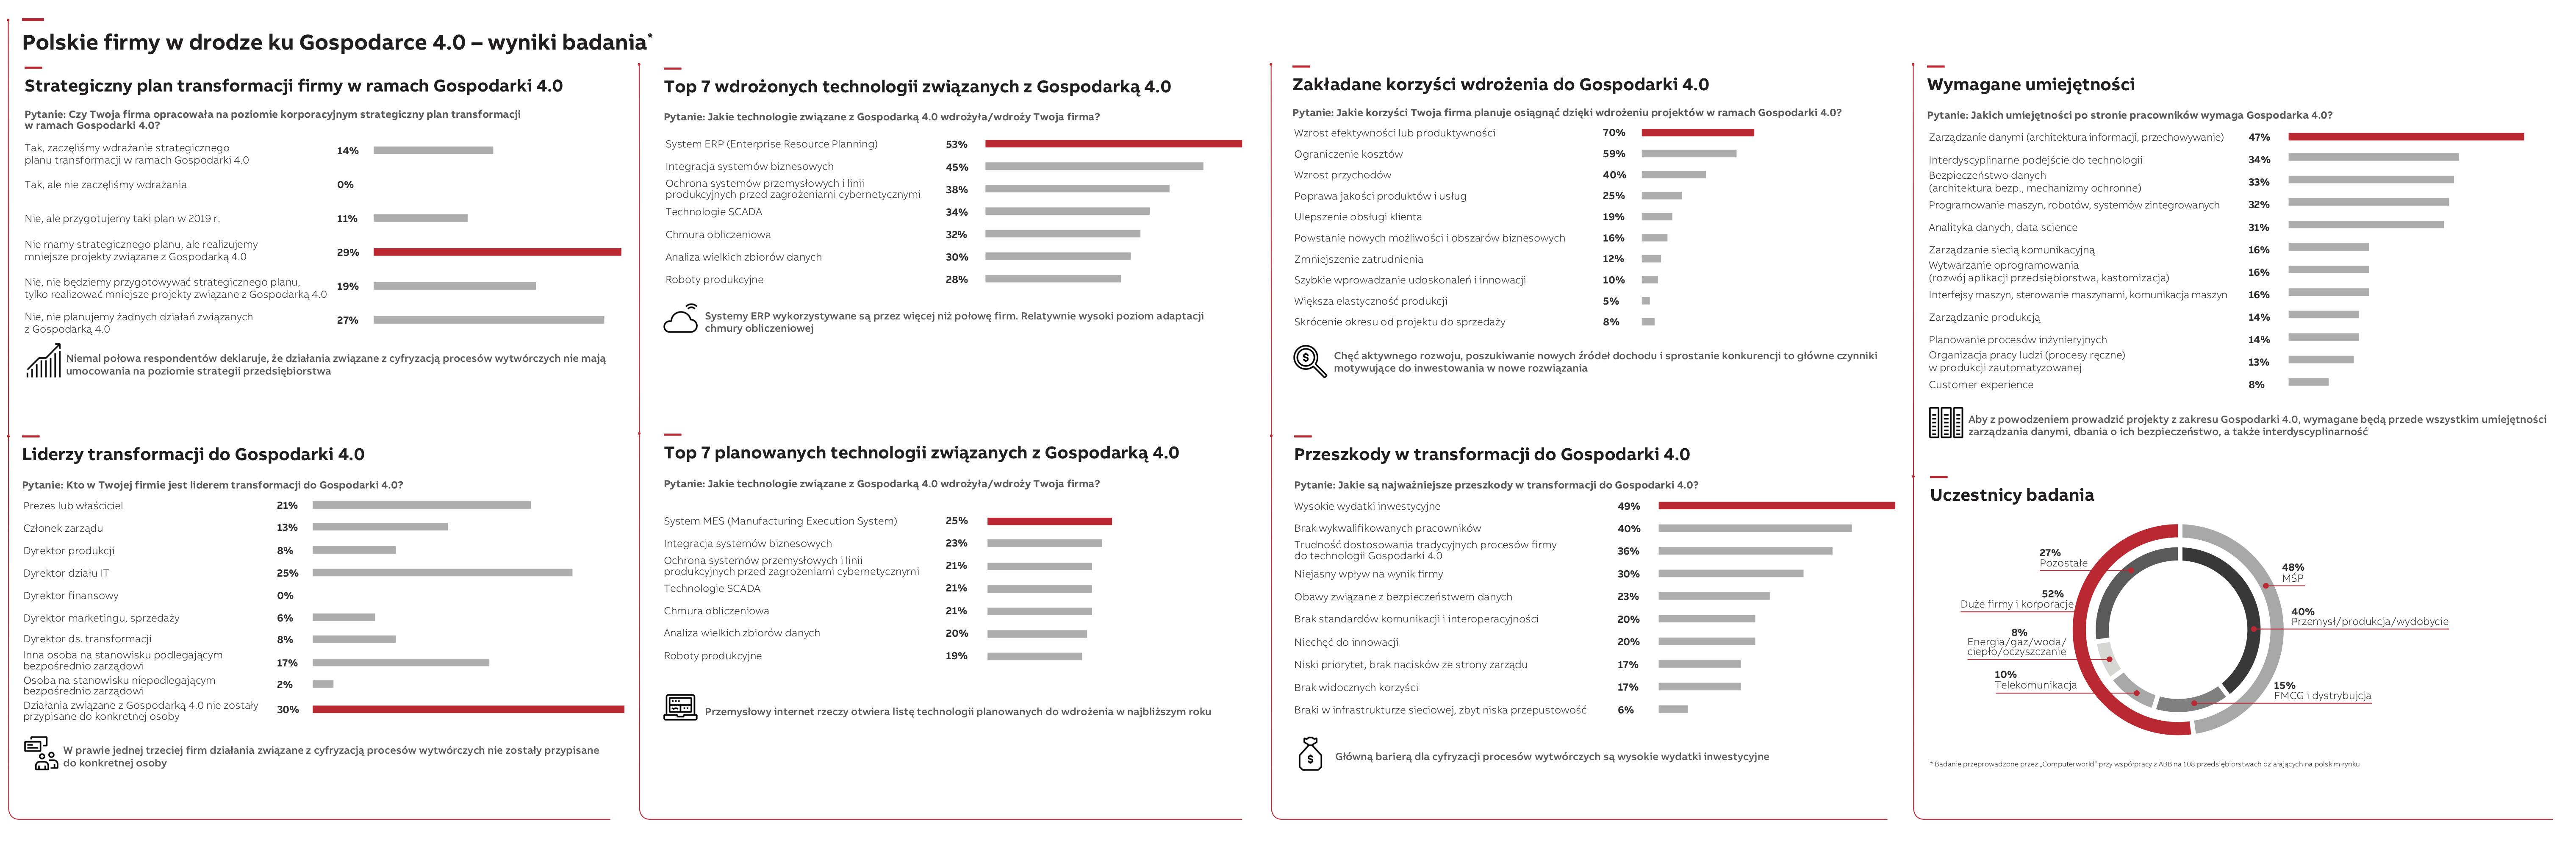 Raport gospodarka 4.0 infografika